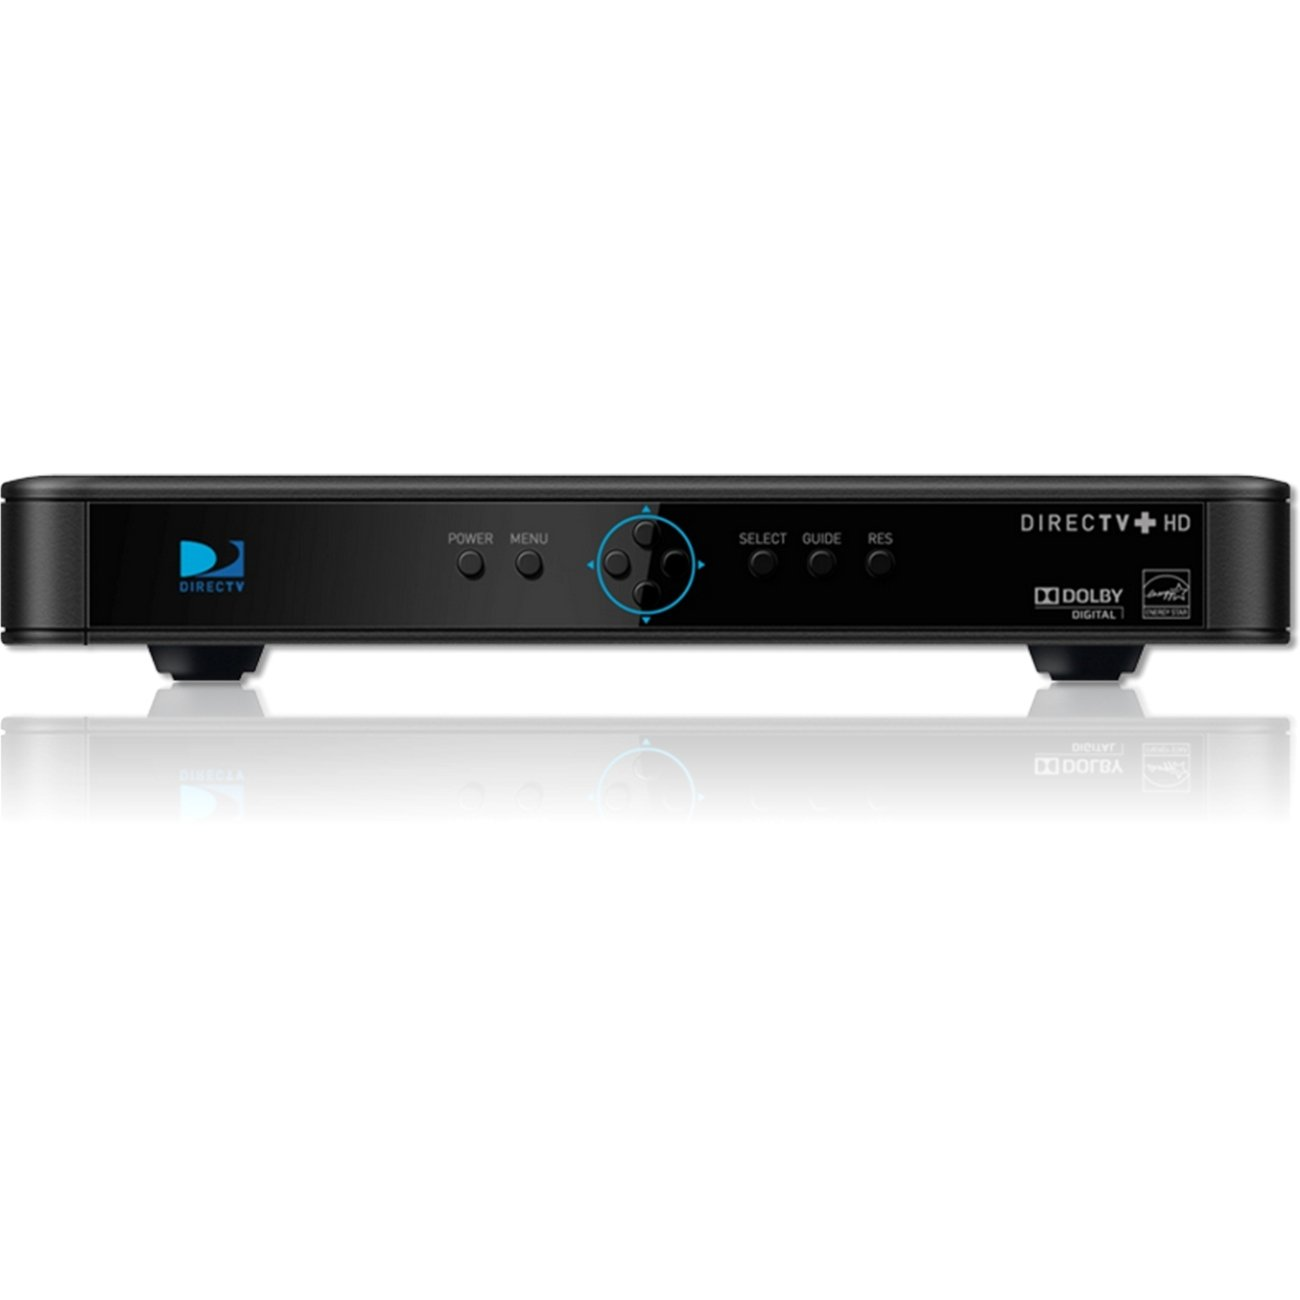 C-Wave DIRECTV High Definition MPEG-4 Receiver H25